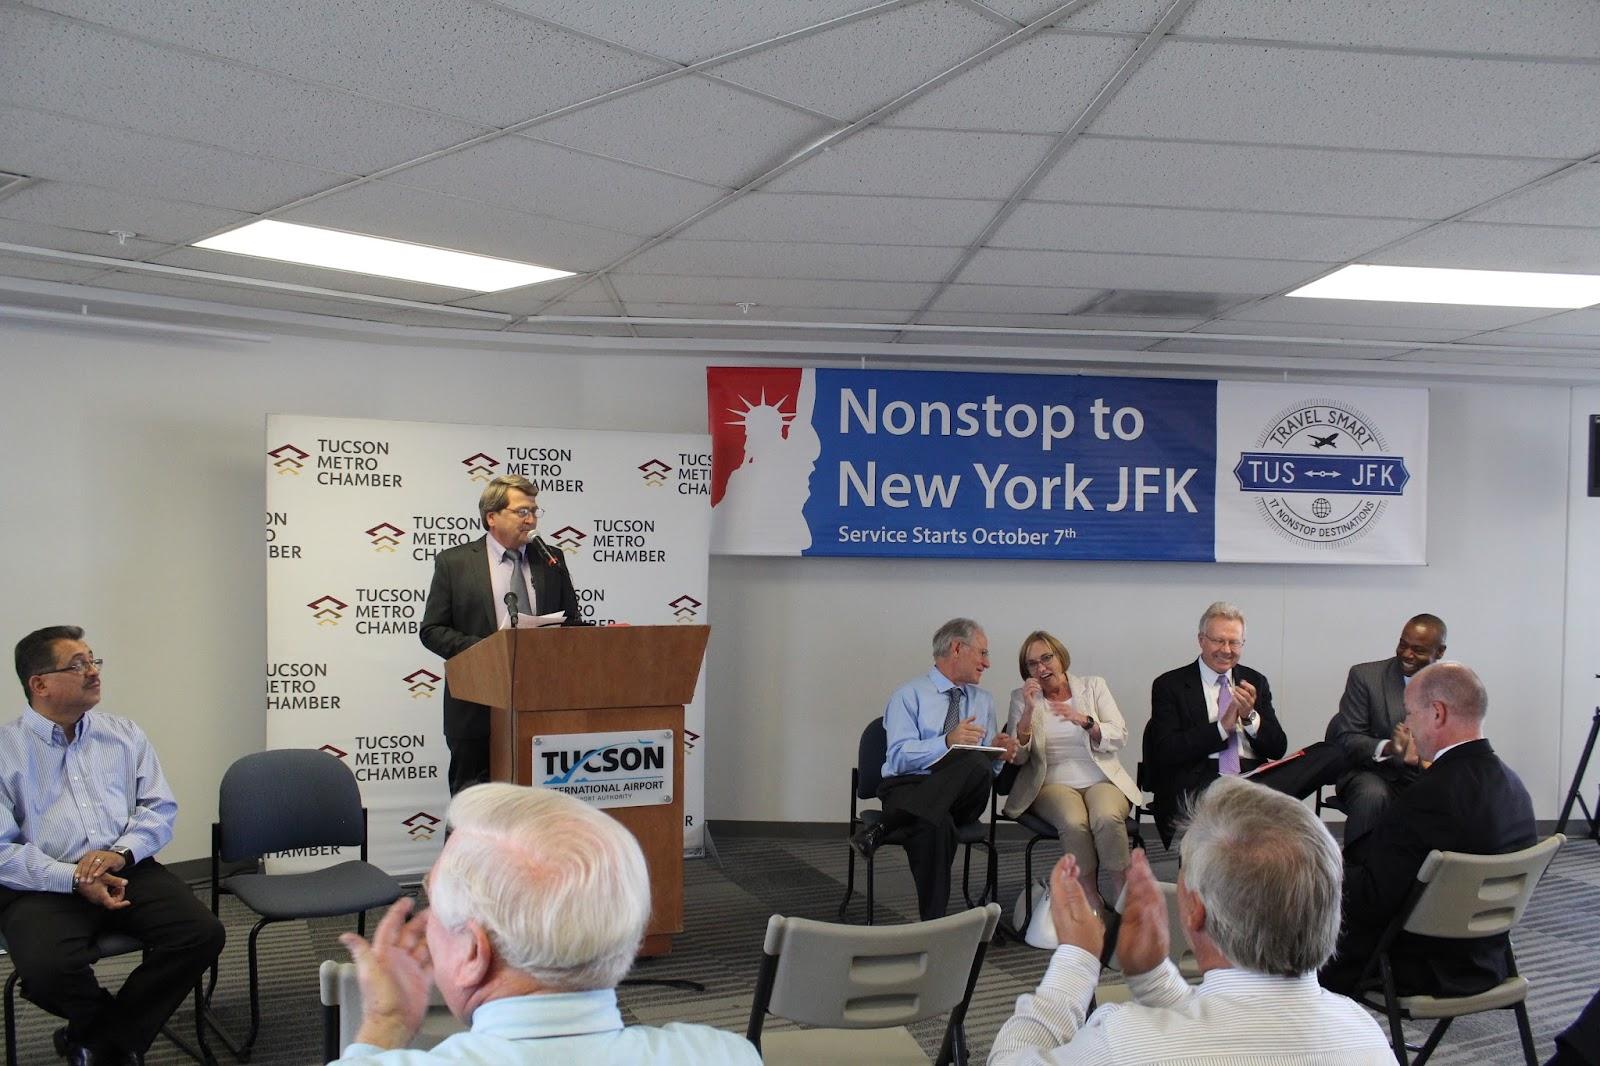 Tucson - JFK Non-Stop Route Announcement - IMG_3174.JPG